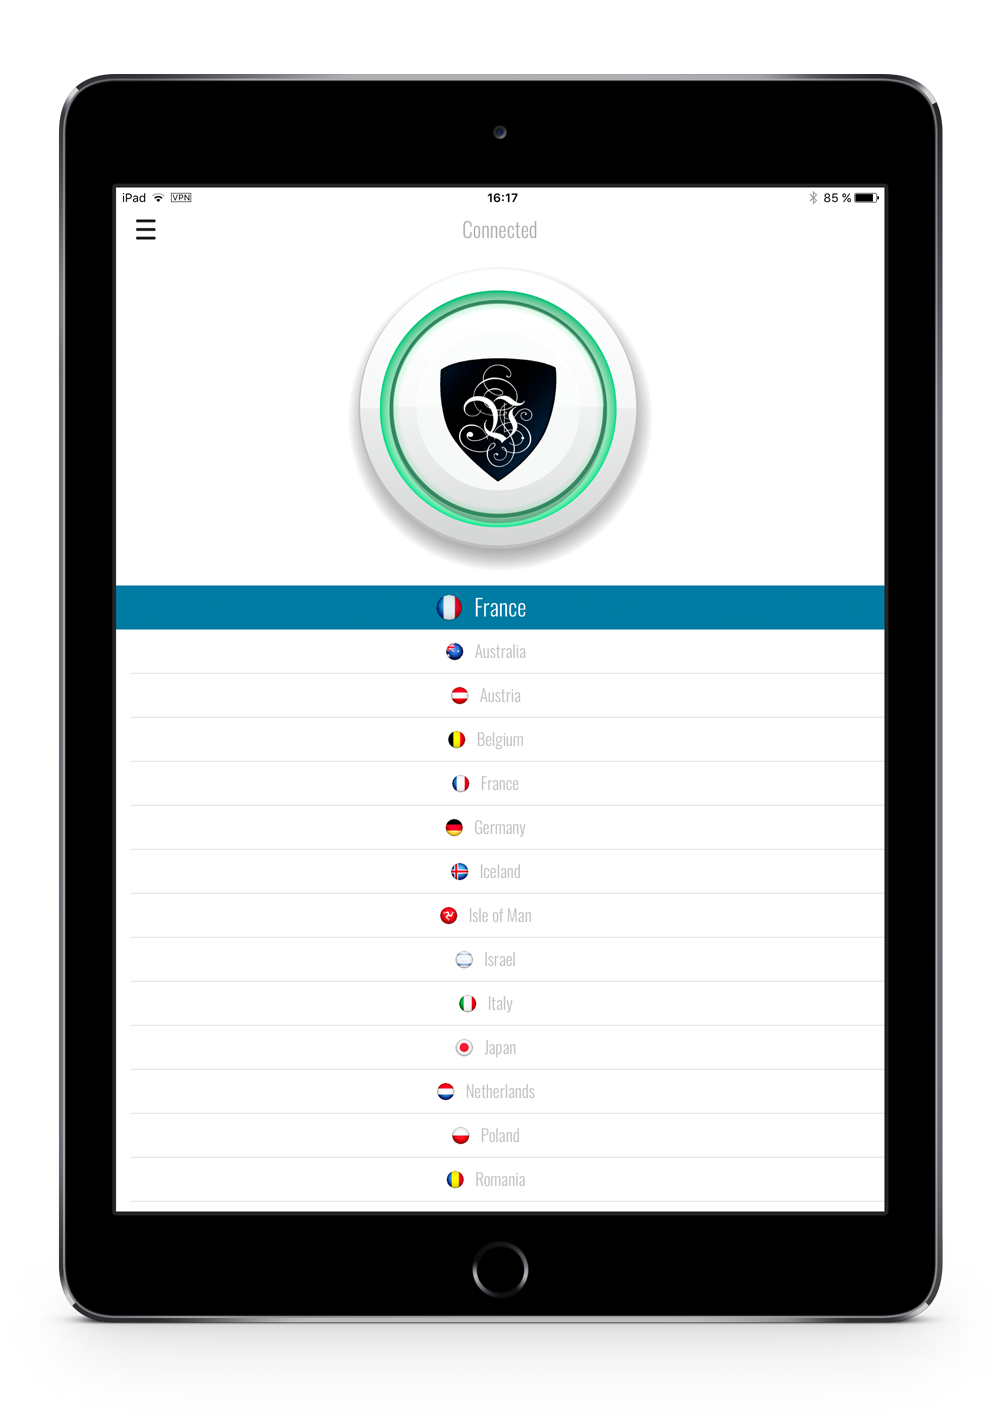 Le VPN for iPad   VPN app for iPad   The best VPN for iPad   best VPN app for iPad   VPN apps for iPad